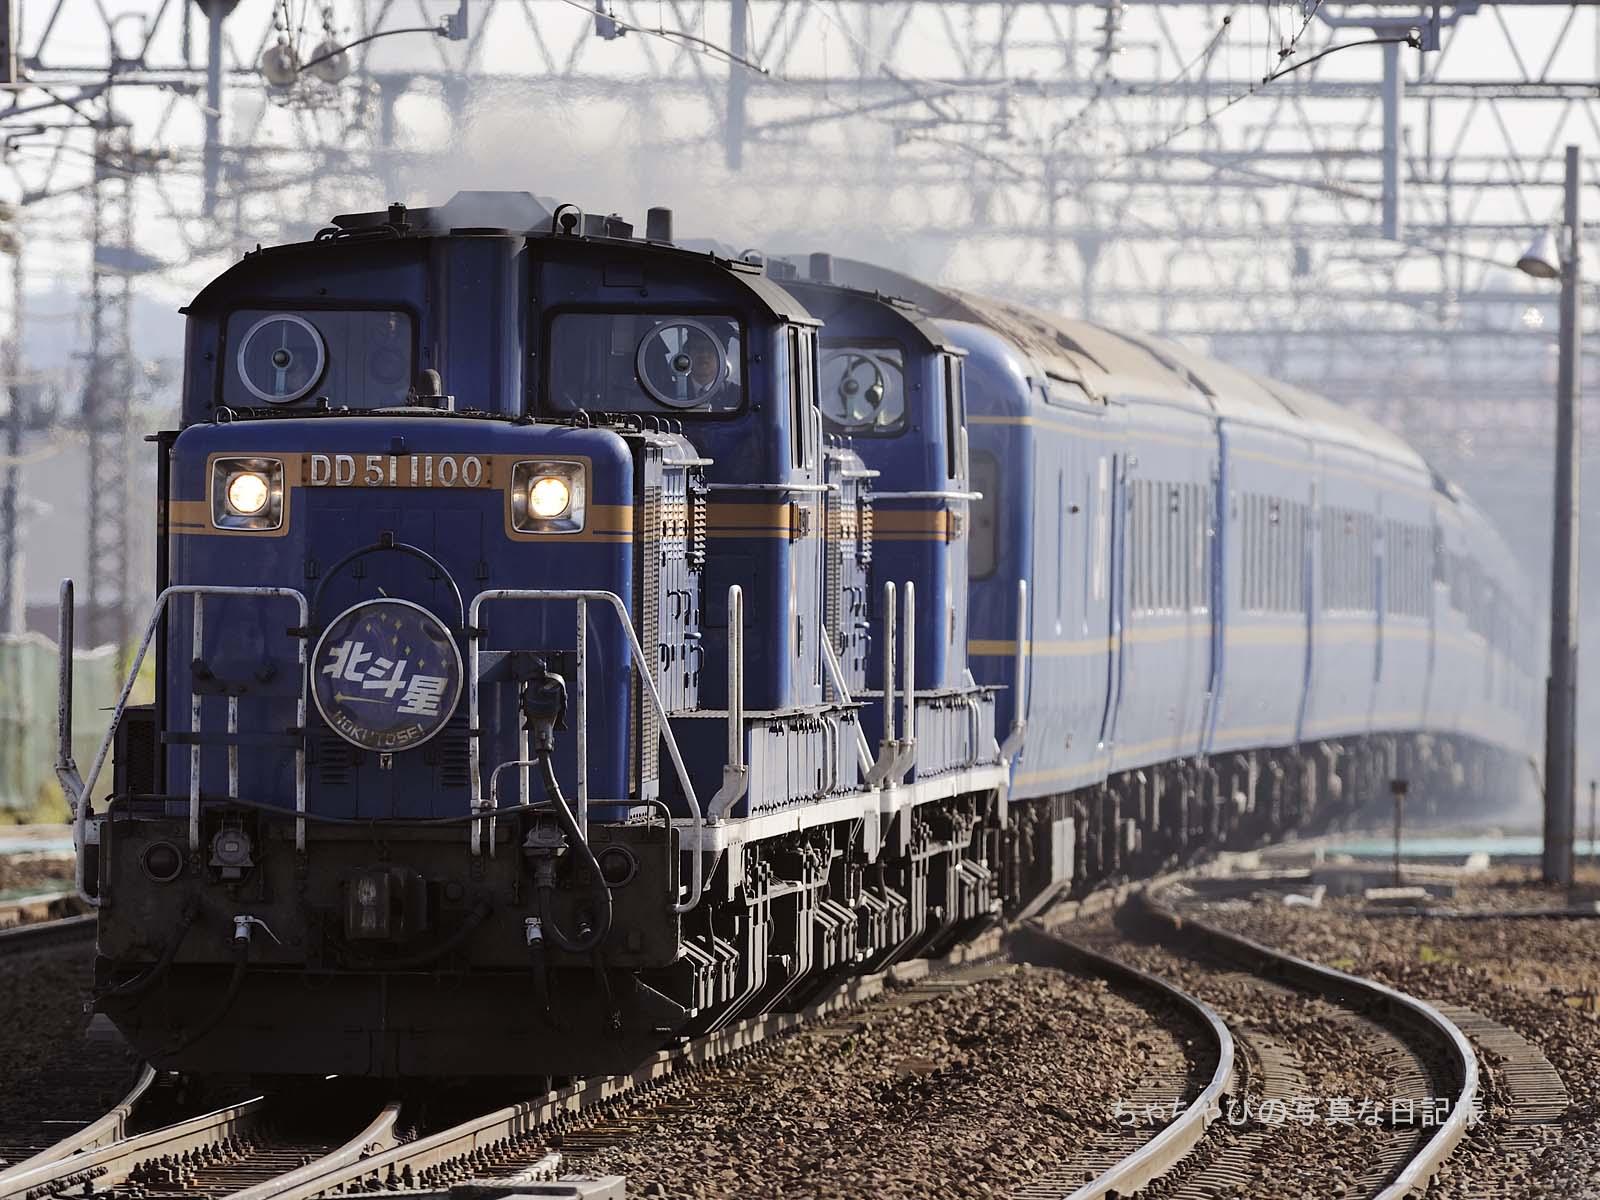 DD51 1100